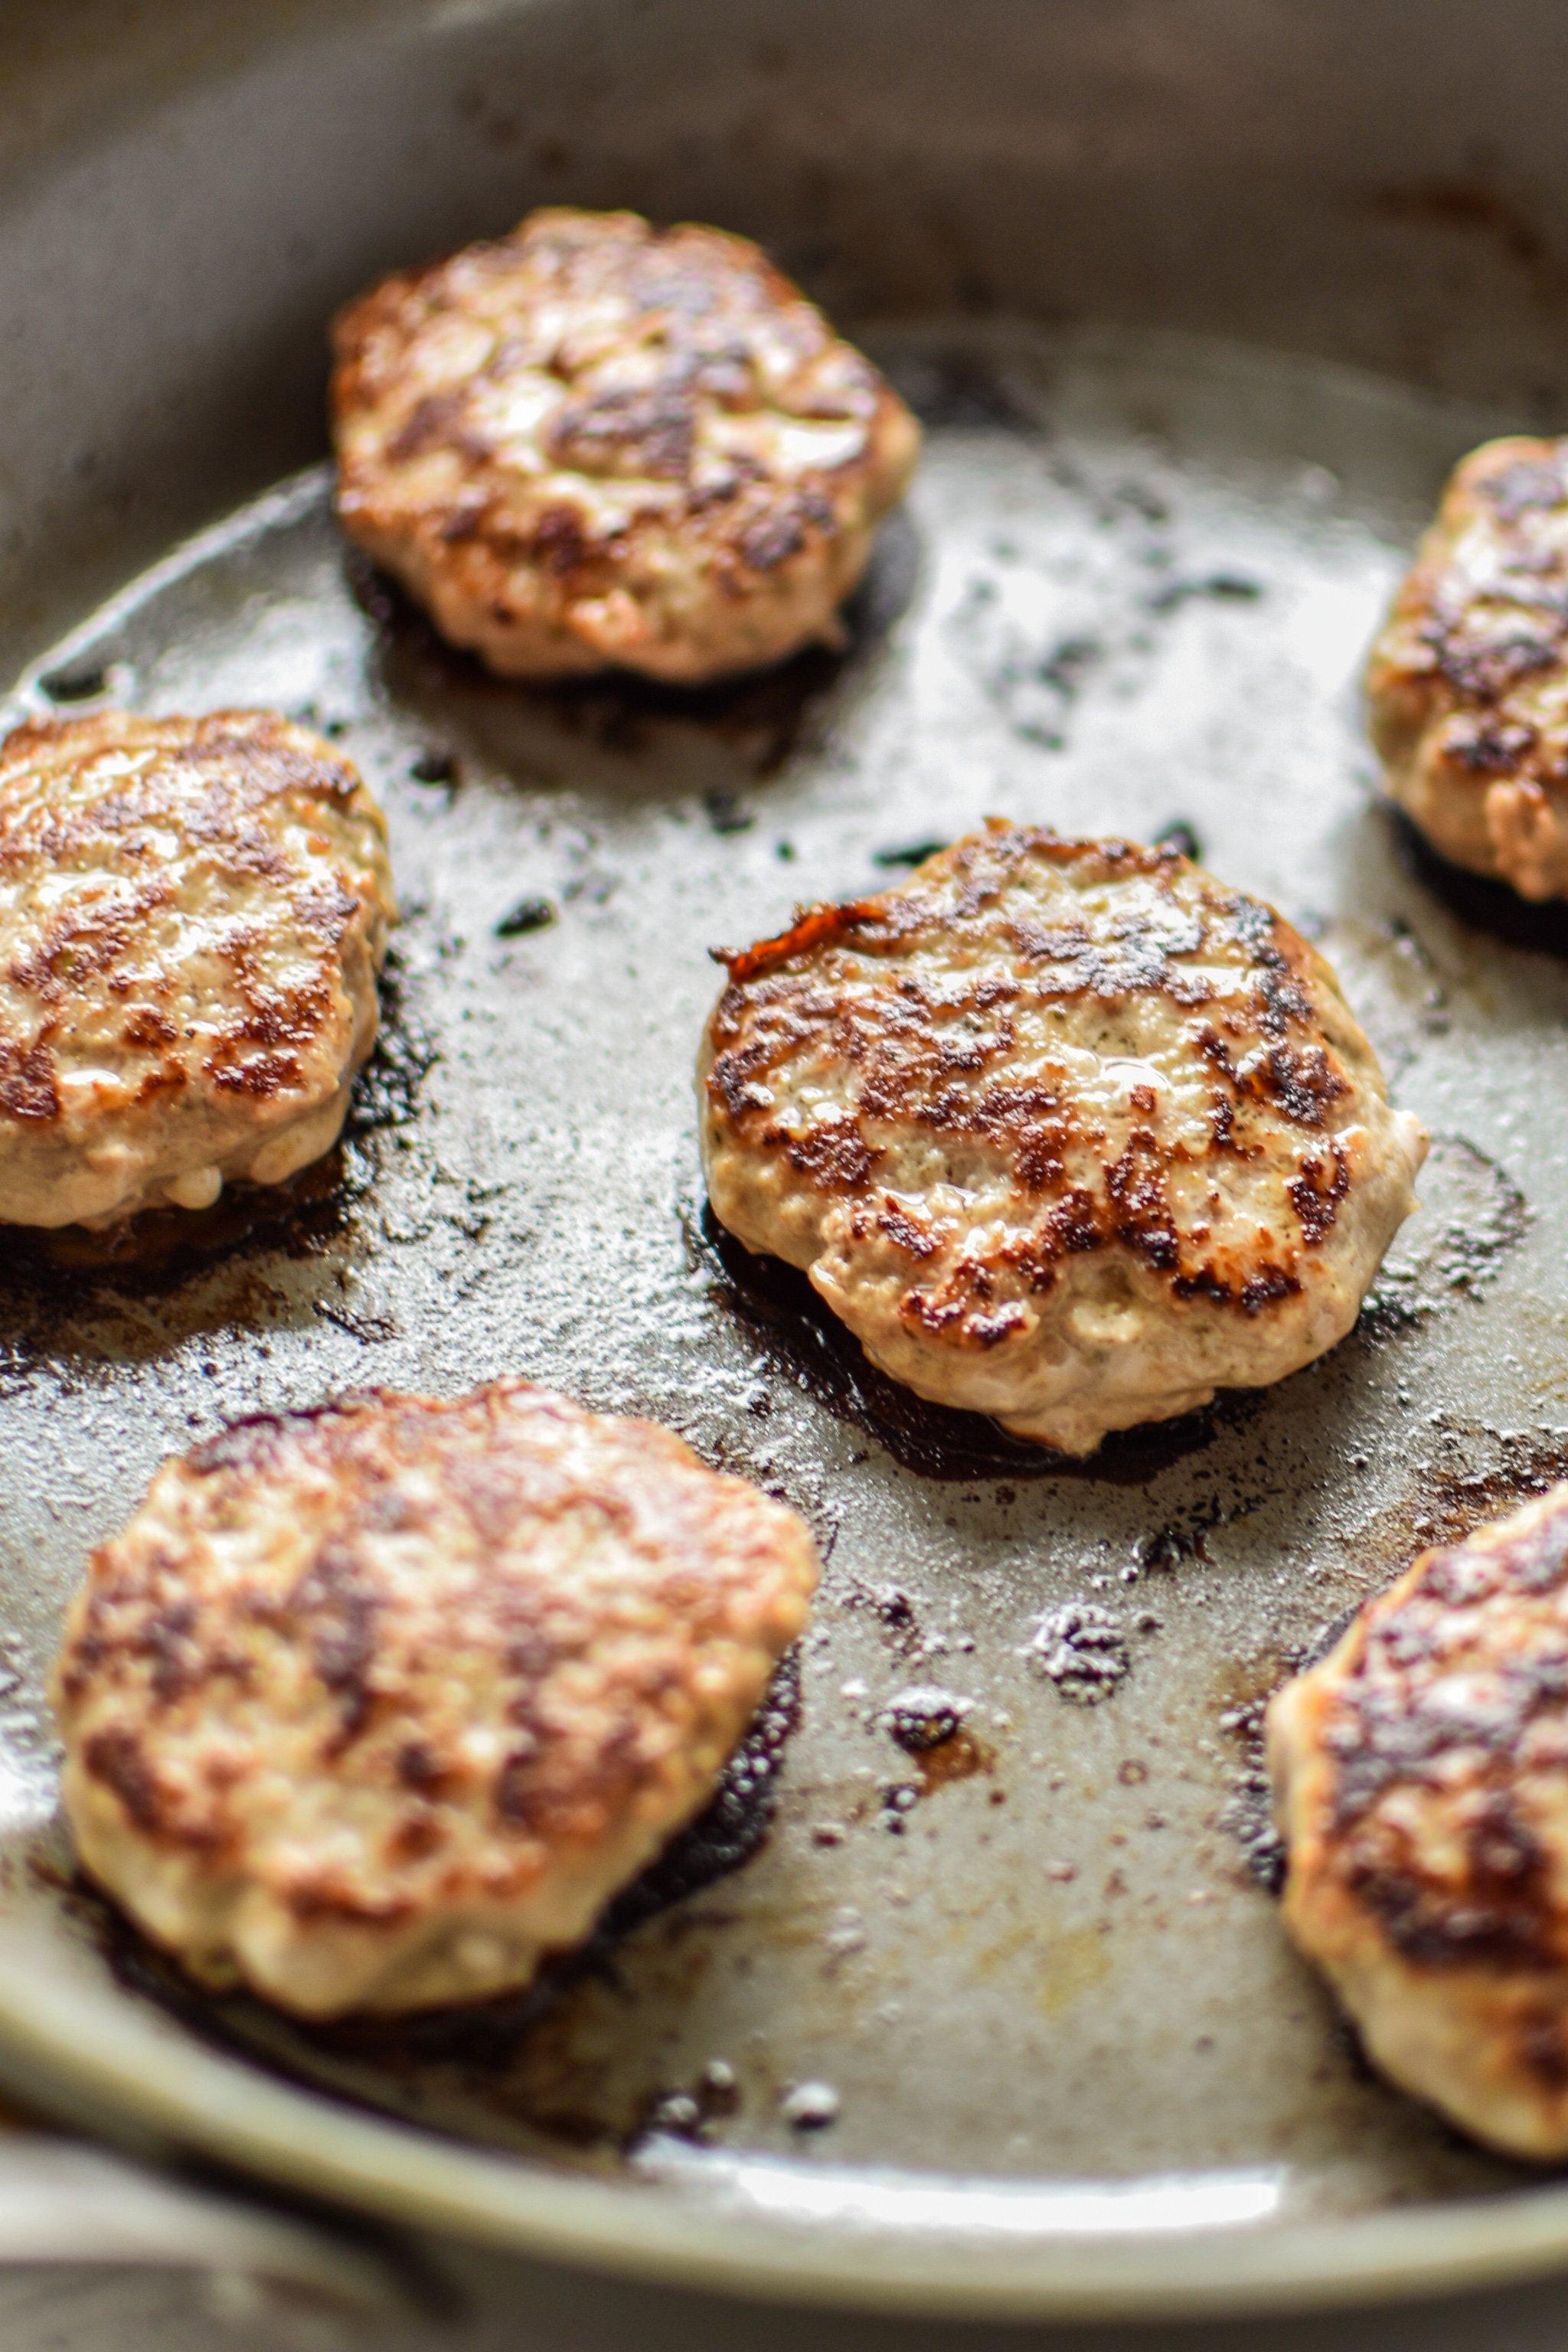 Ground turkey breakfast sausage patties frying in the pan.